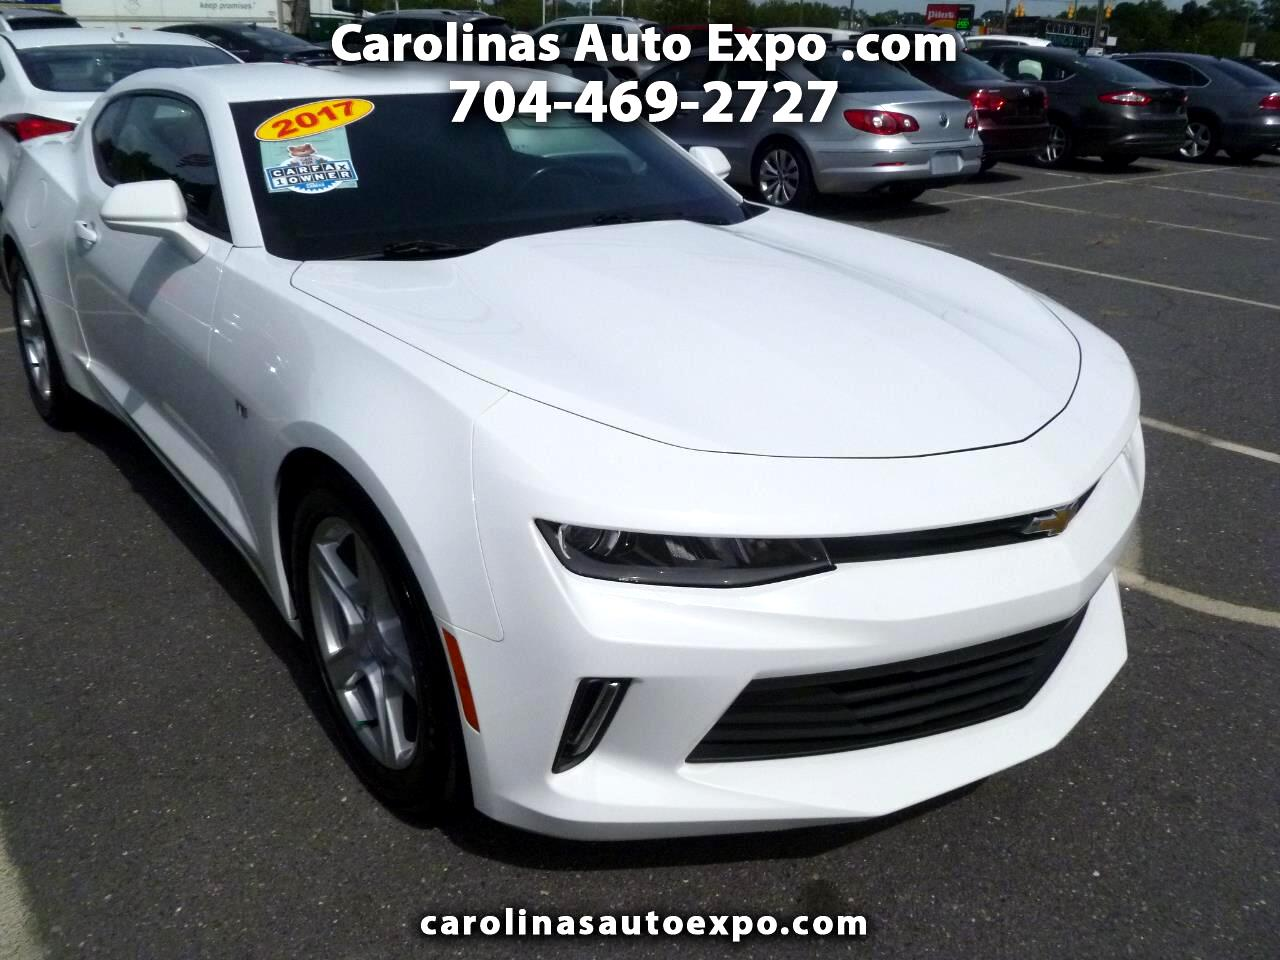 Chevrolet Camaro 2dr Cpe 1LT 2017